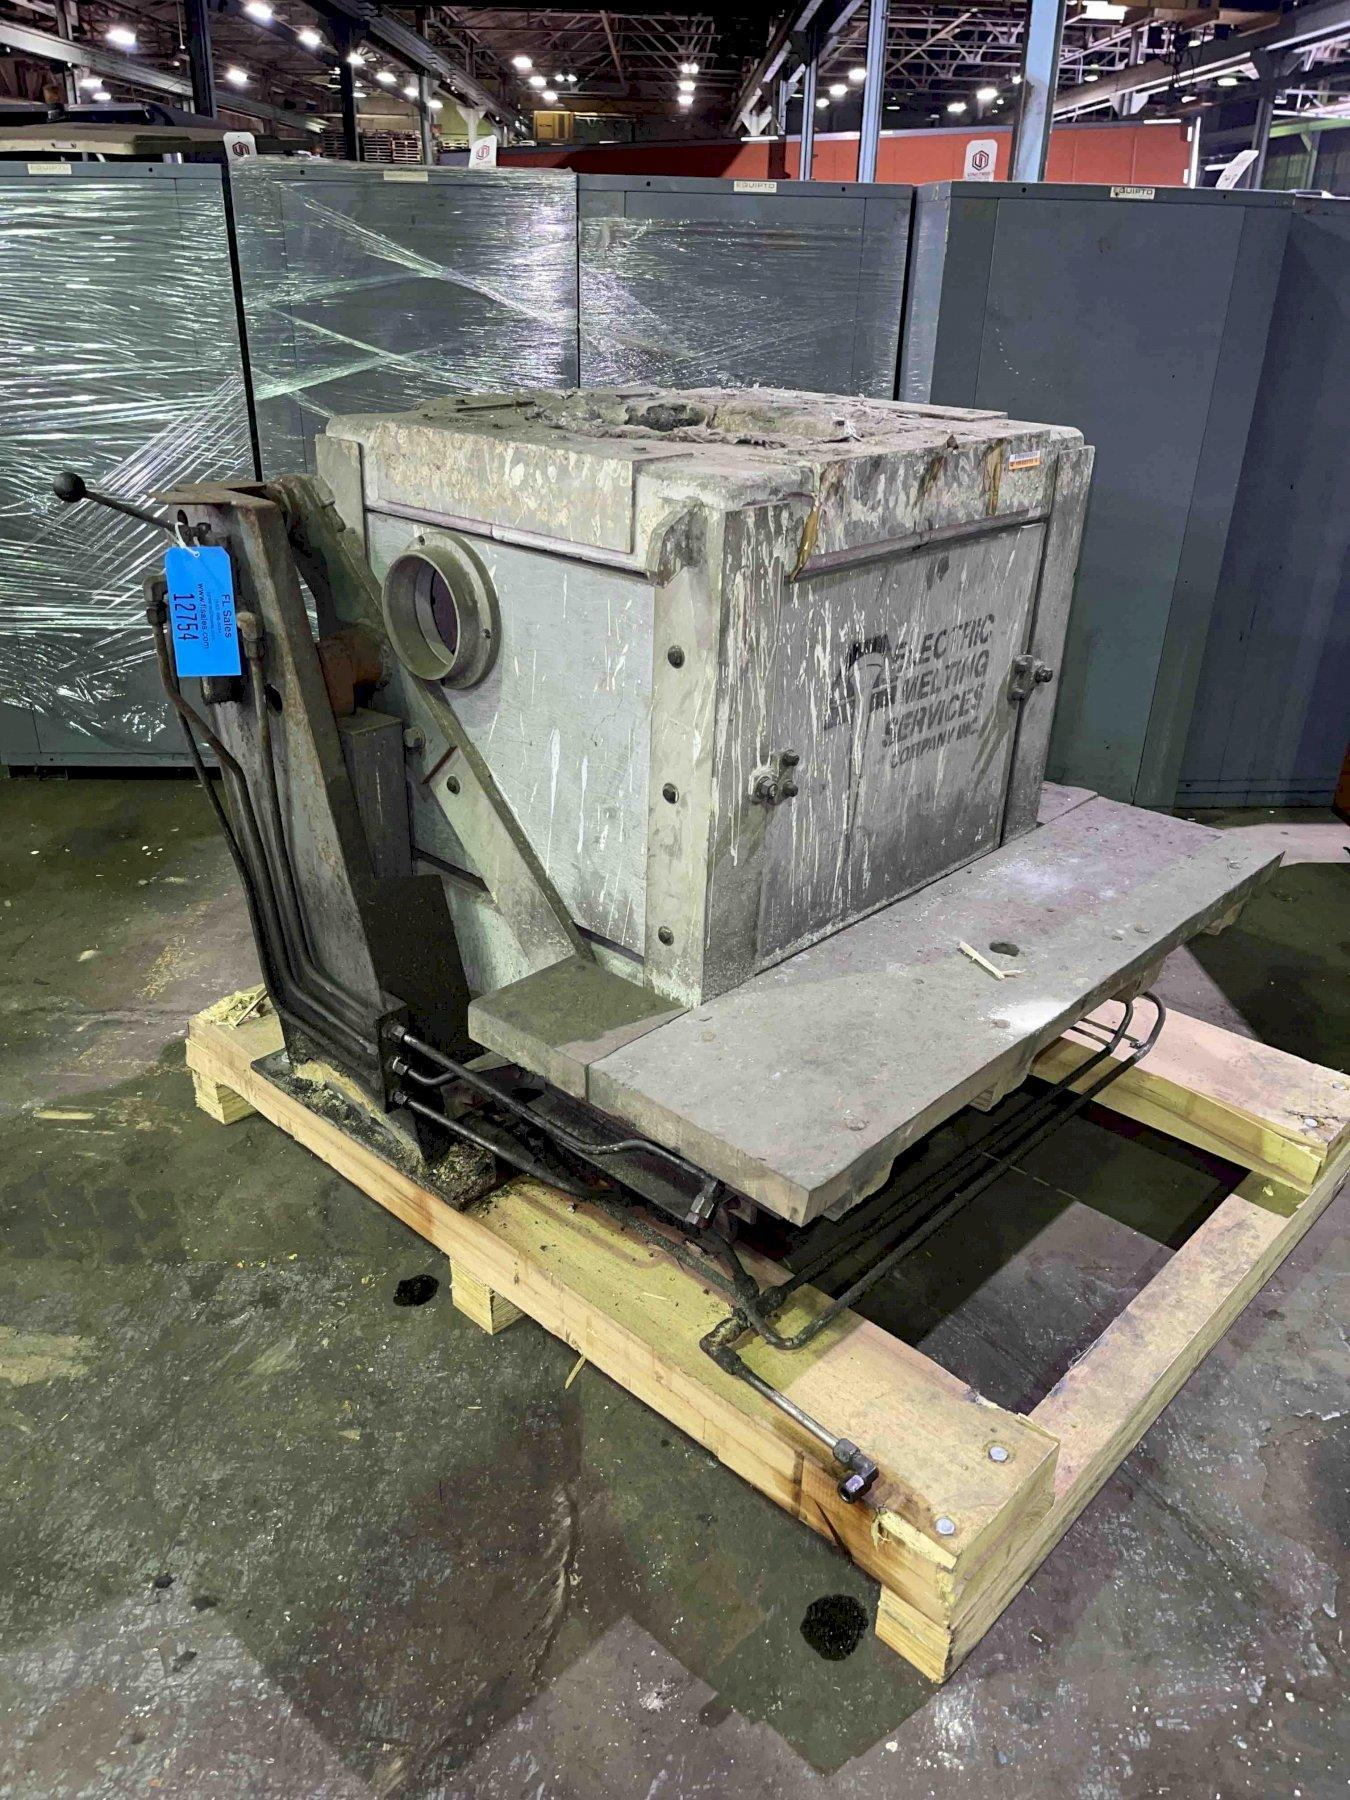 HYDRAULIC TILT TRANSITE BOX FURNACE WITH STAND NO HYDRAULIC PUMP,